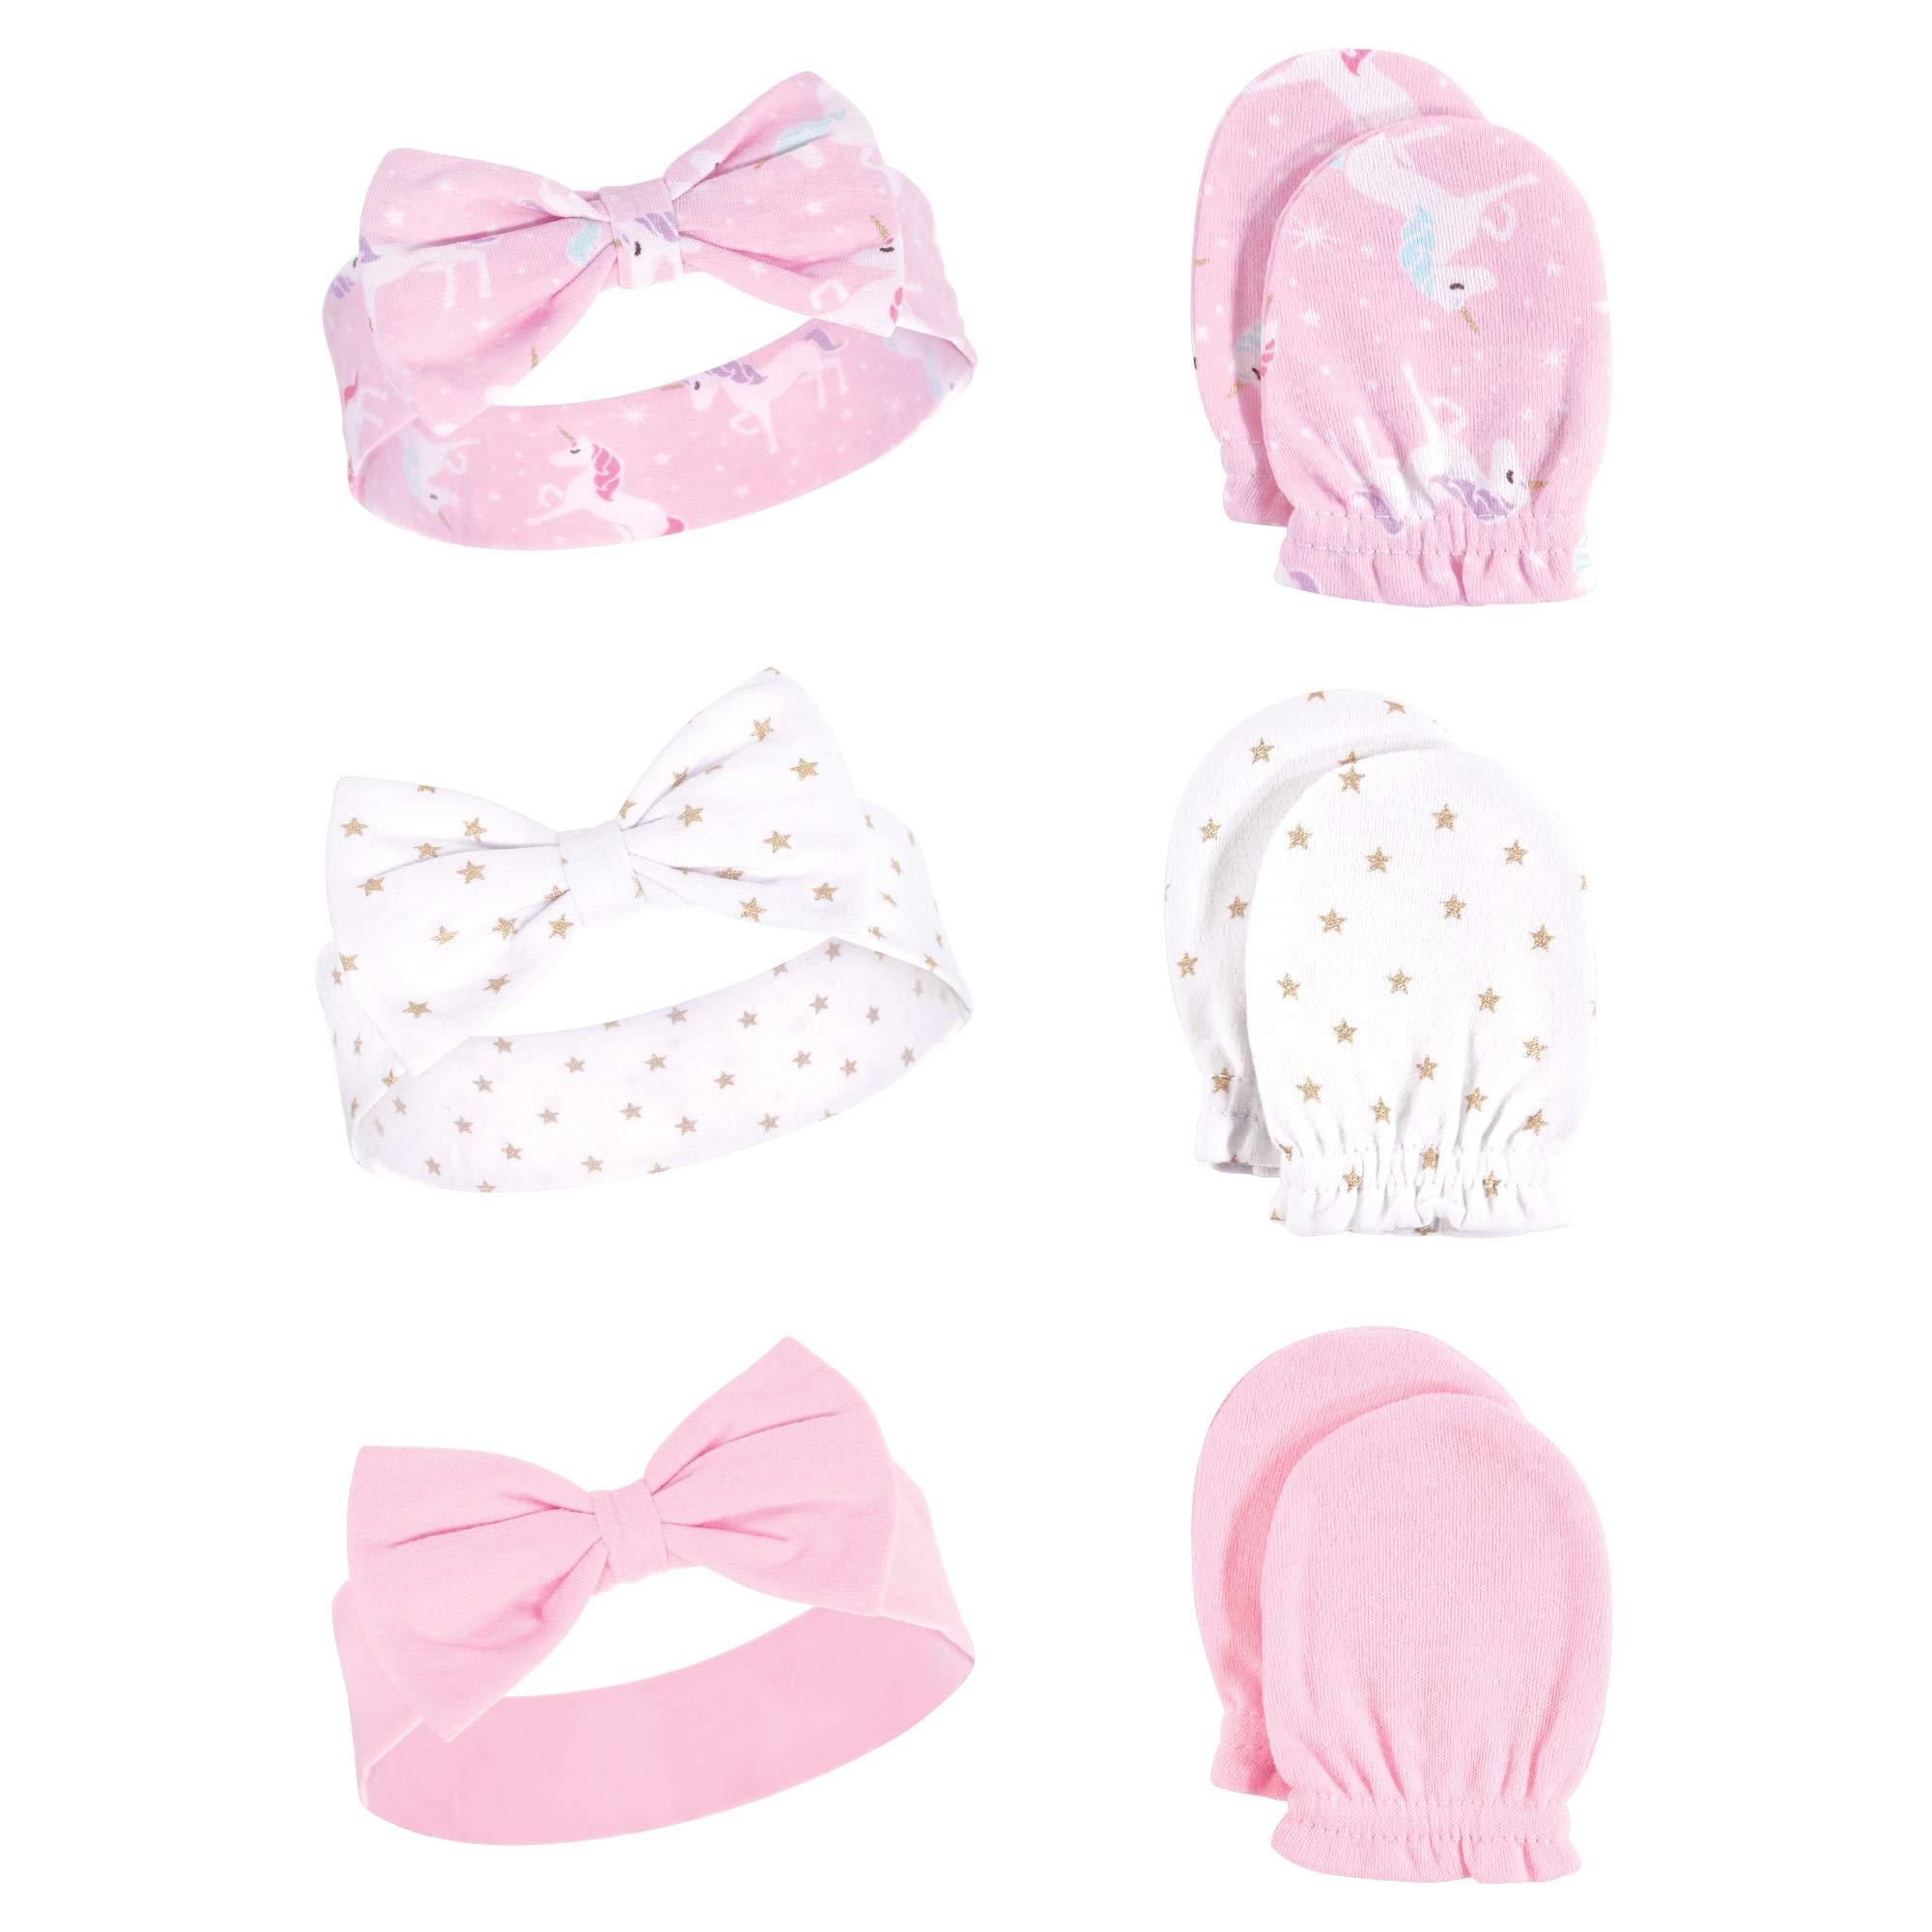 Unisex Cotton Headband and Scratch Mitten Set